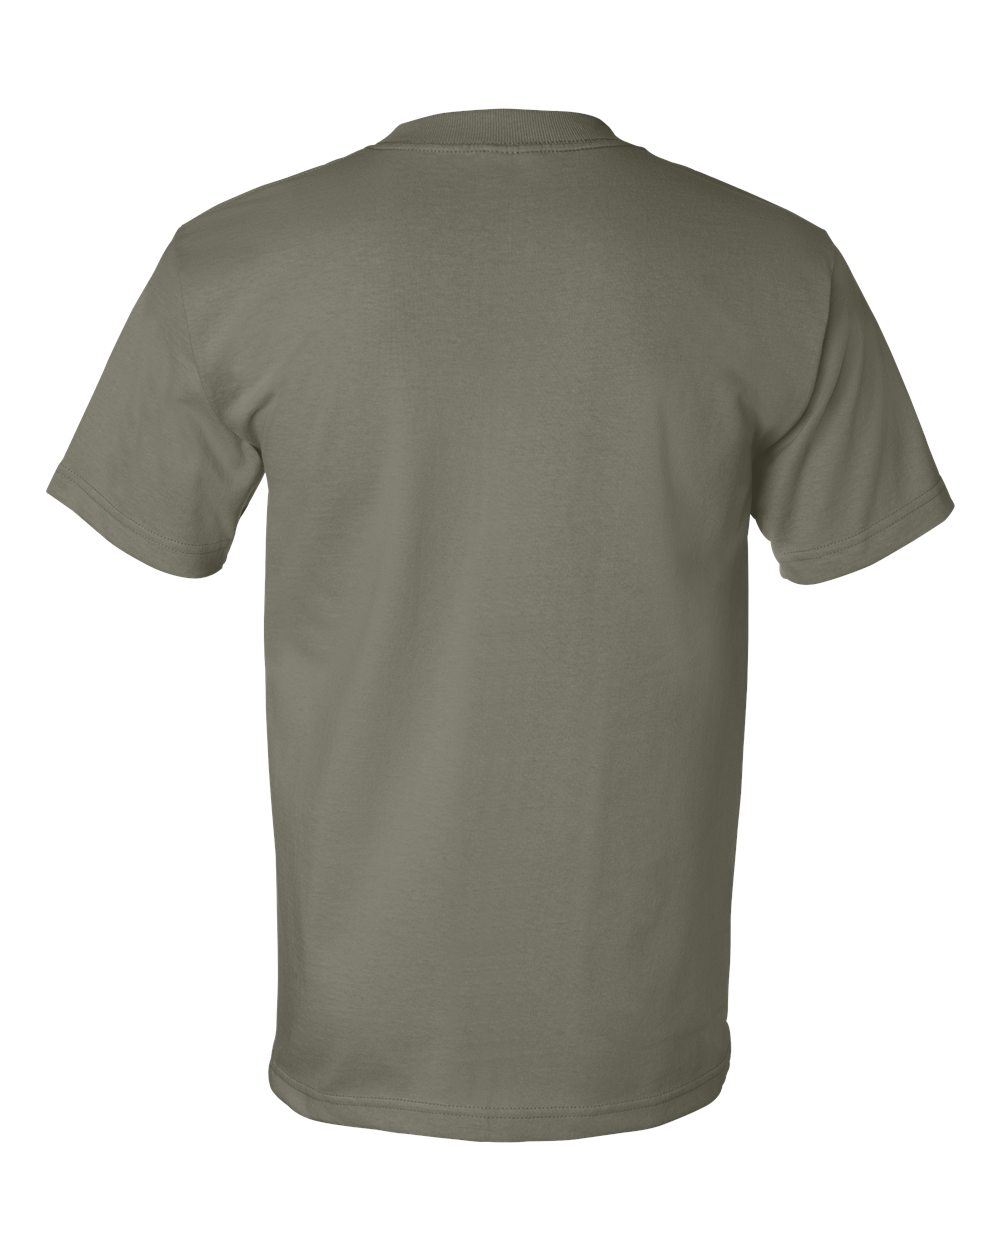 Bayside-Mens-Cotton-Blank-USA-Made-Short-Sleeve-T-Shirt-5100-up-to-5XL thumbnail 40